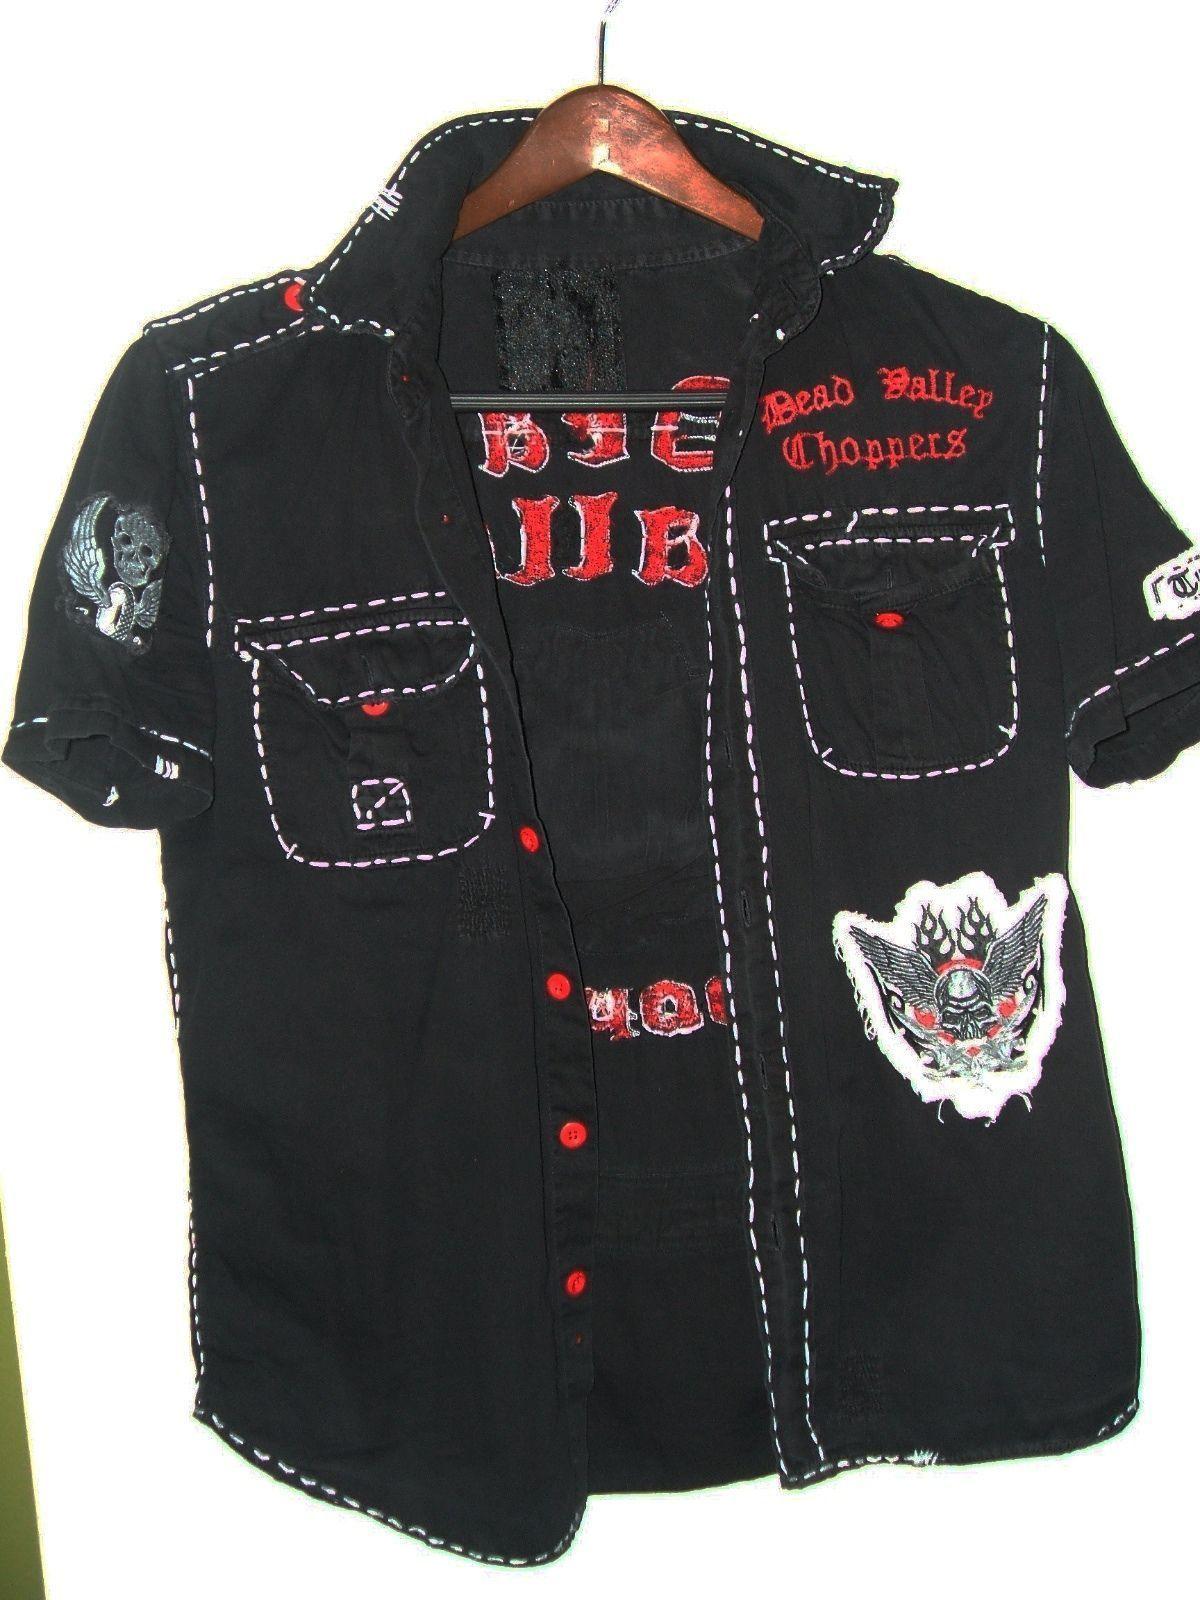 Dead Valley Choppers mens casual designer shirt size MEDIUM - $75.00